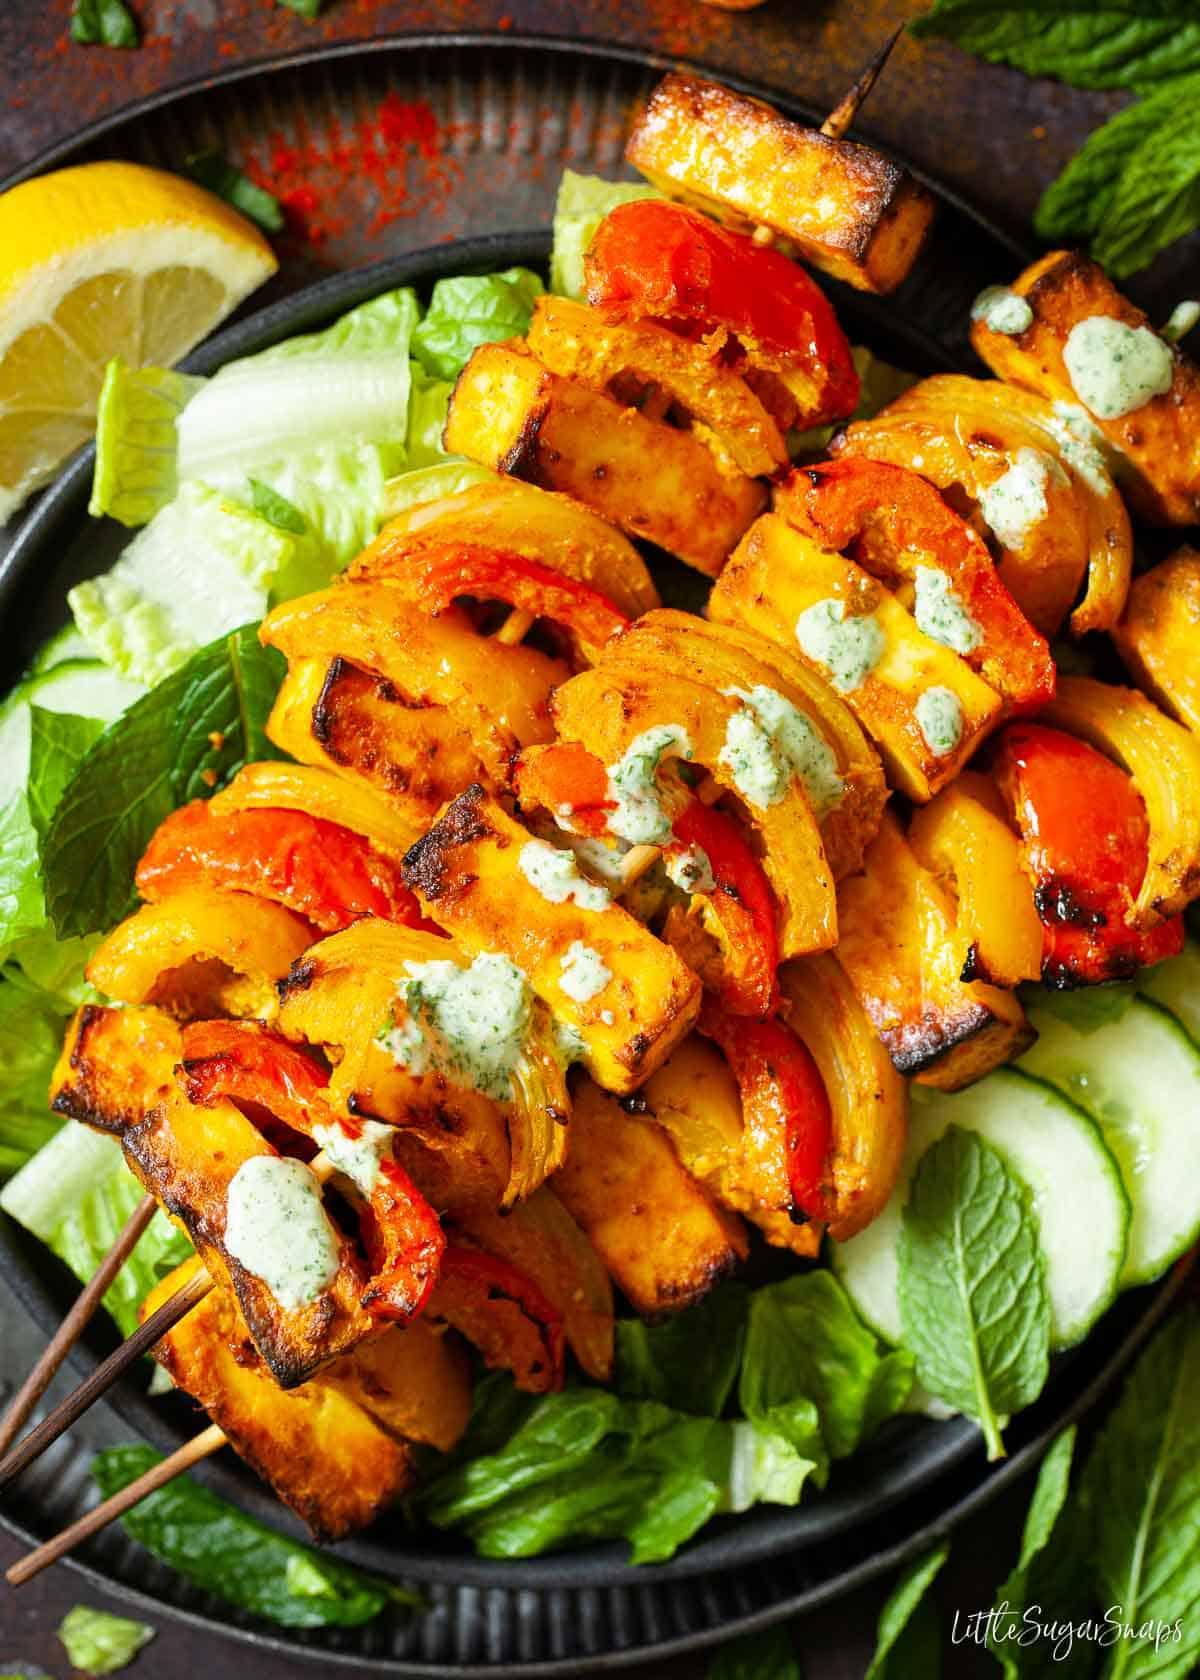 Paneer tikka kebabs on green salad with yoghurt sauce drizzled on top